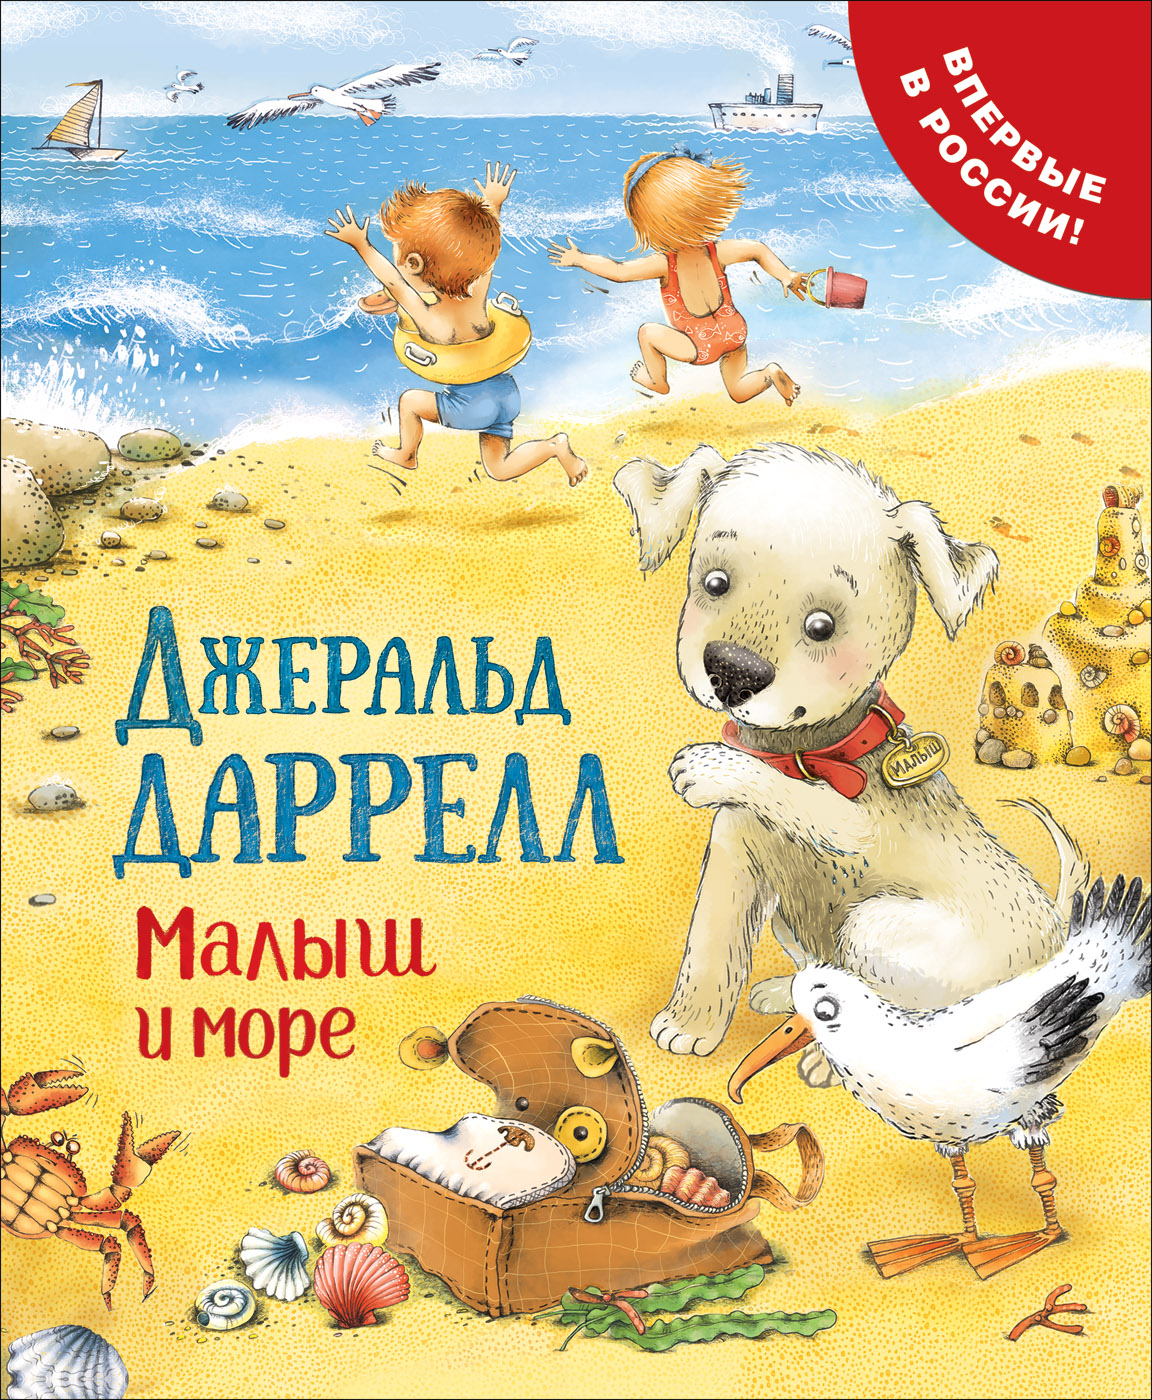 Даррелл Дж. Даррелл Дж. Малыш и море  (Про щенка)